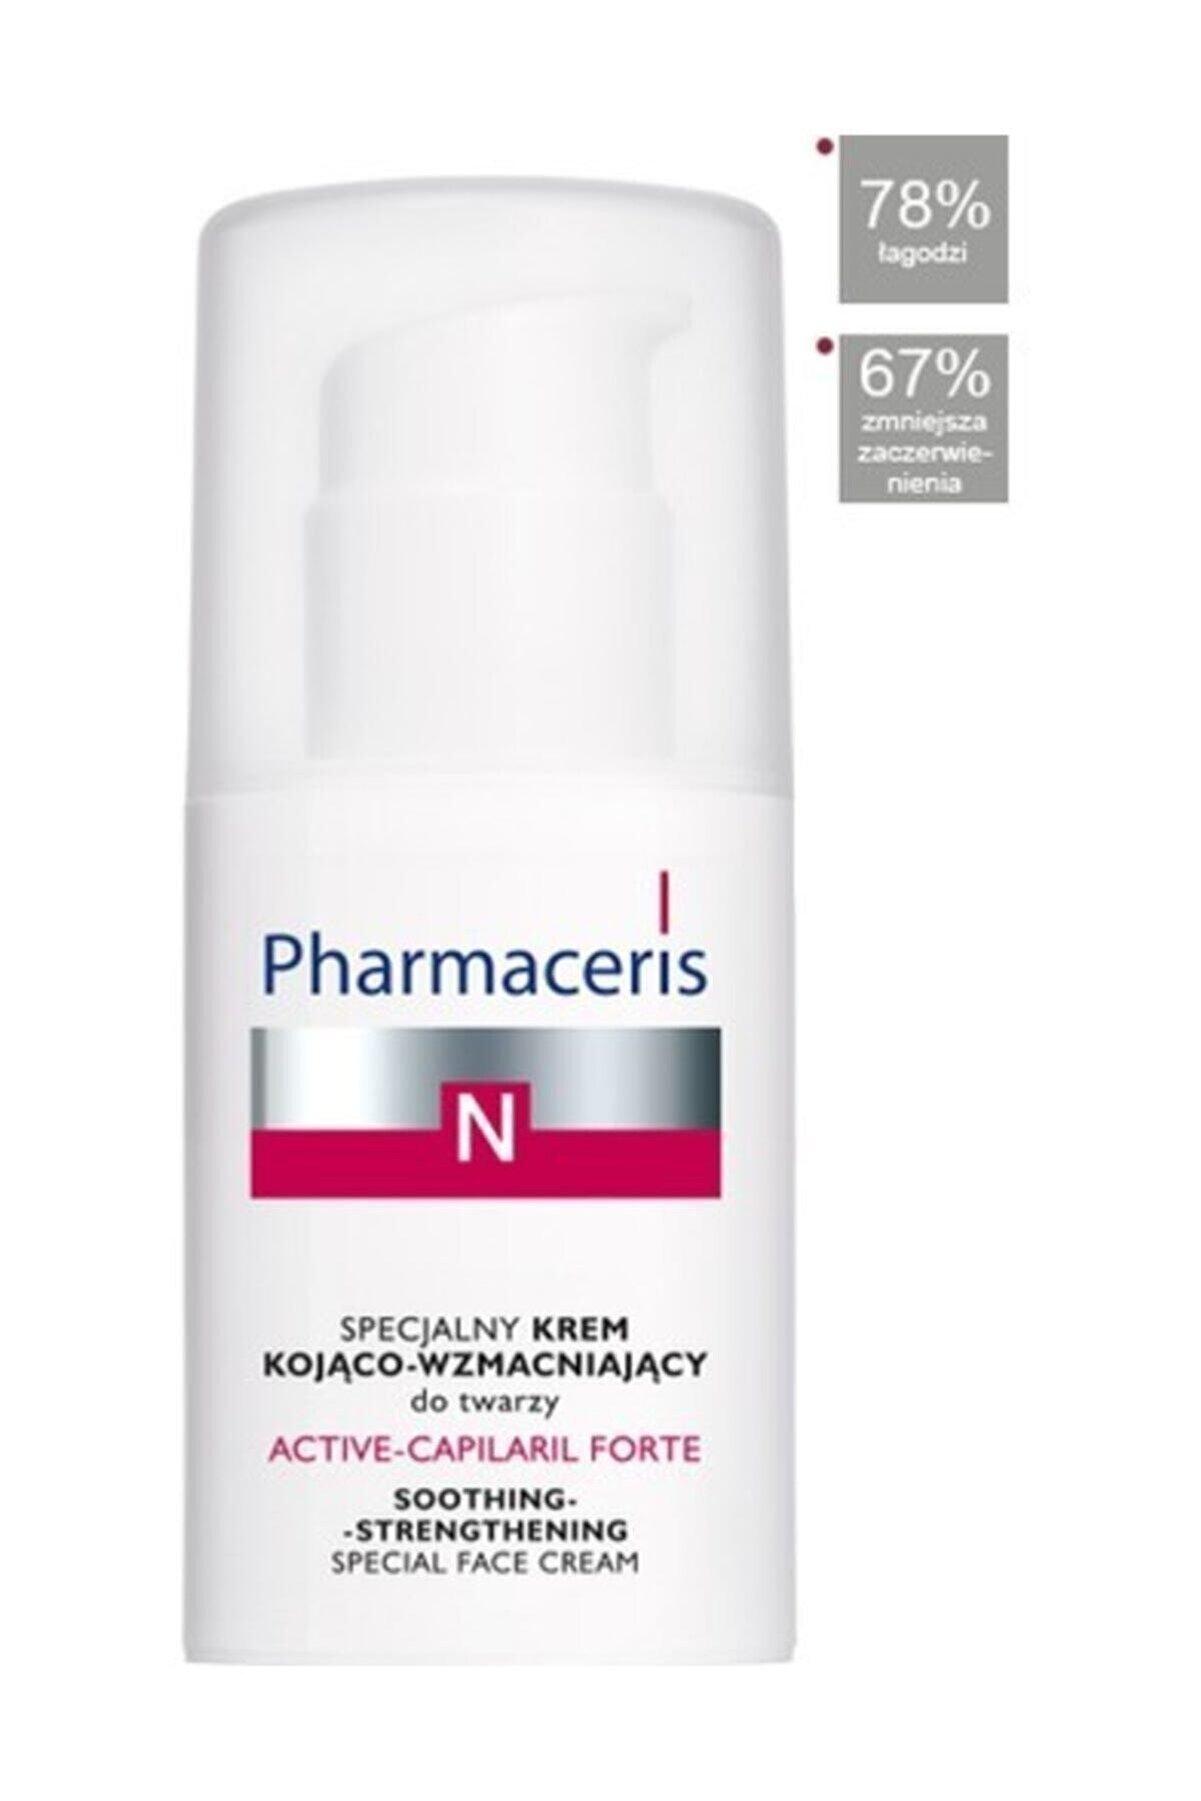 Pharmaceris Active Capilaril Forte Soothing-strengthening Cream 30 ml